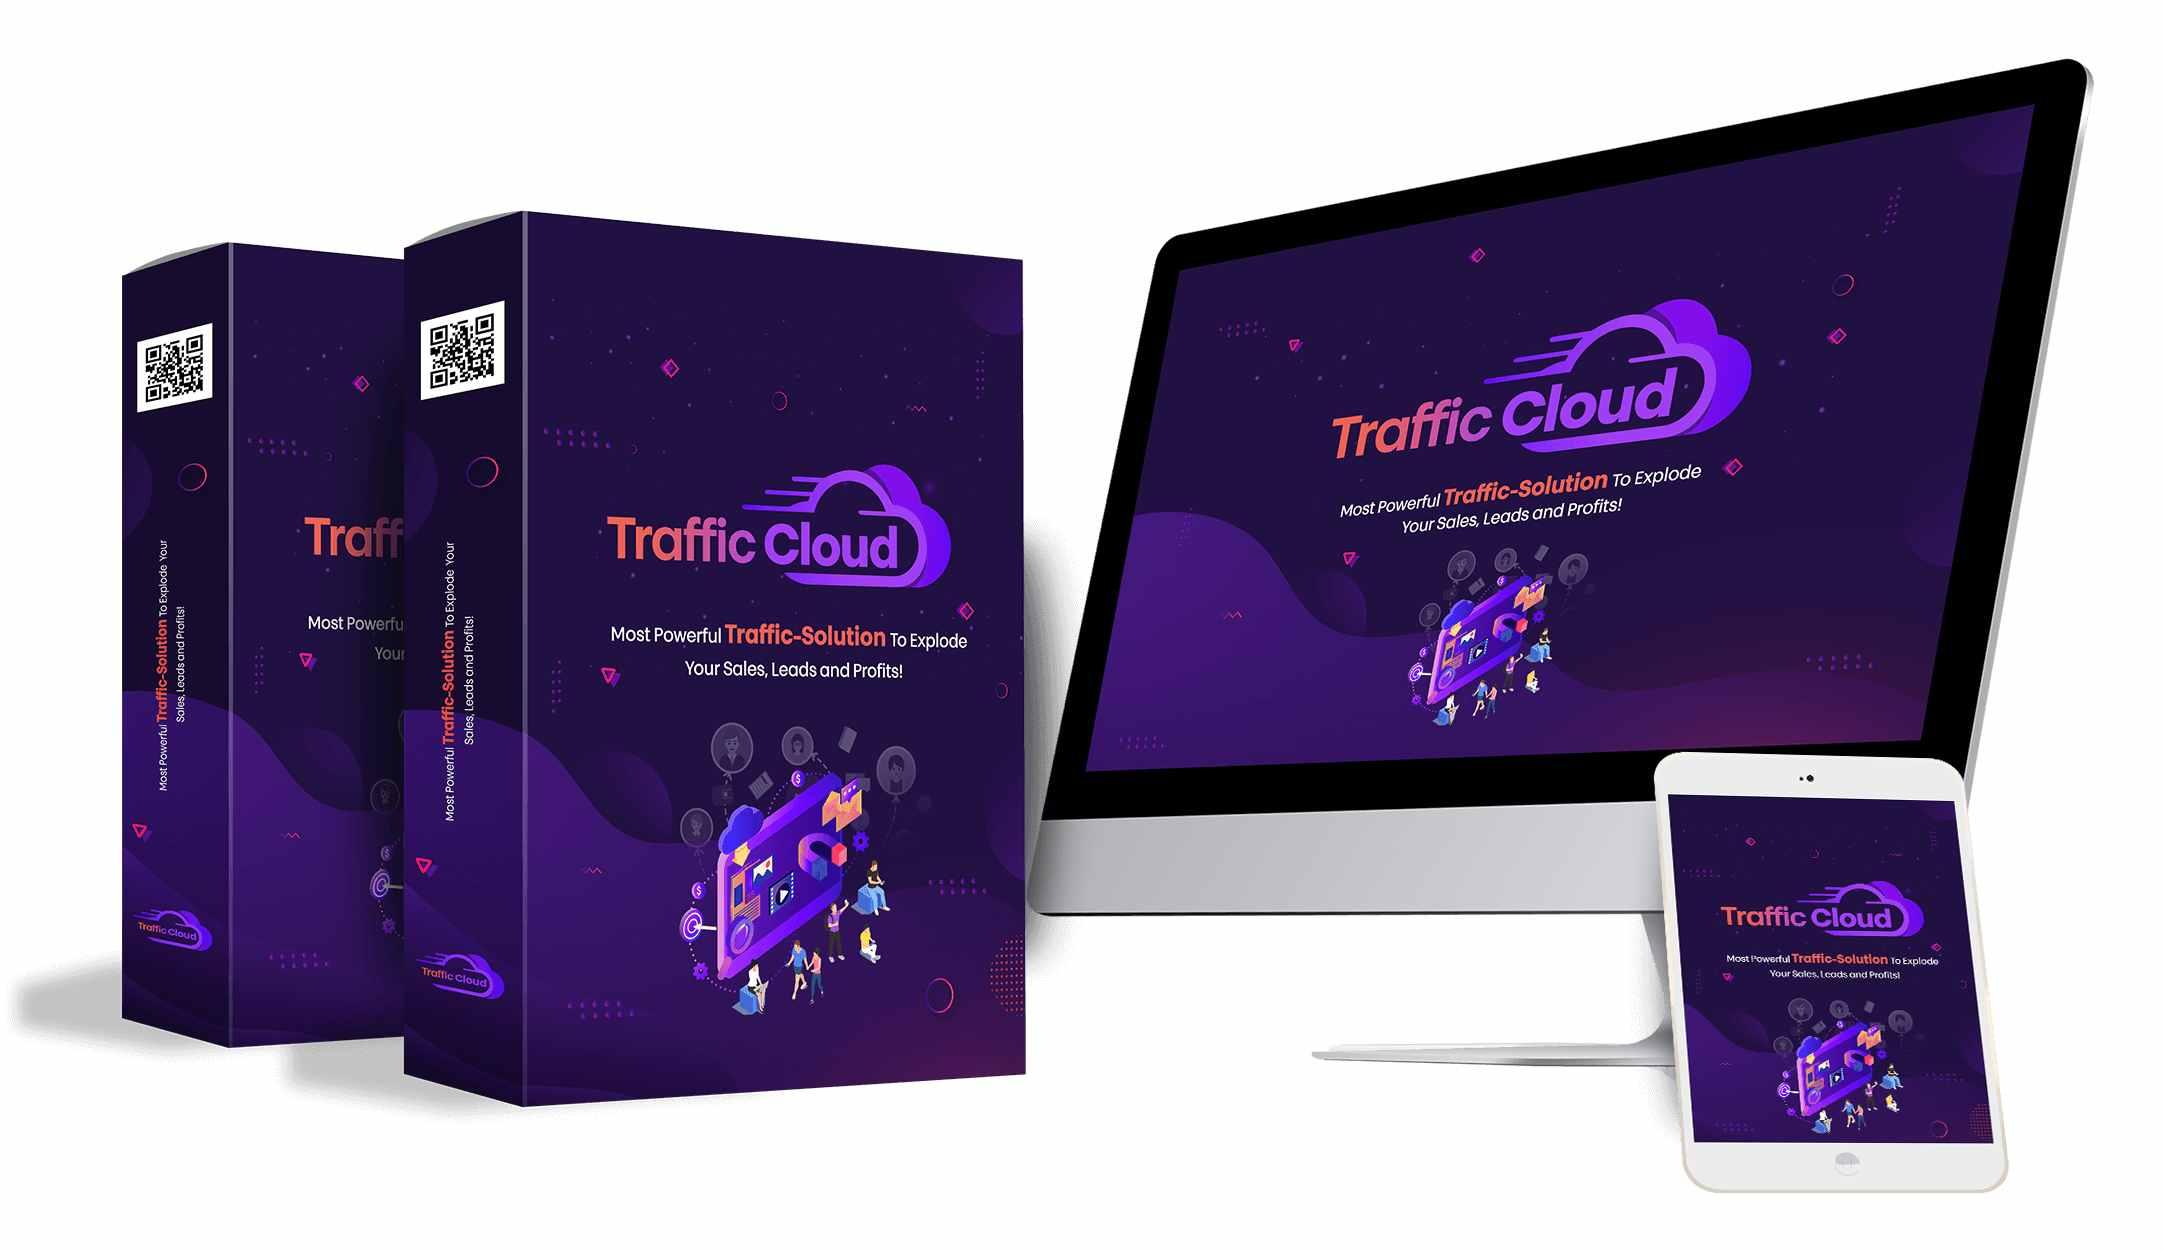 TrafficCloud